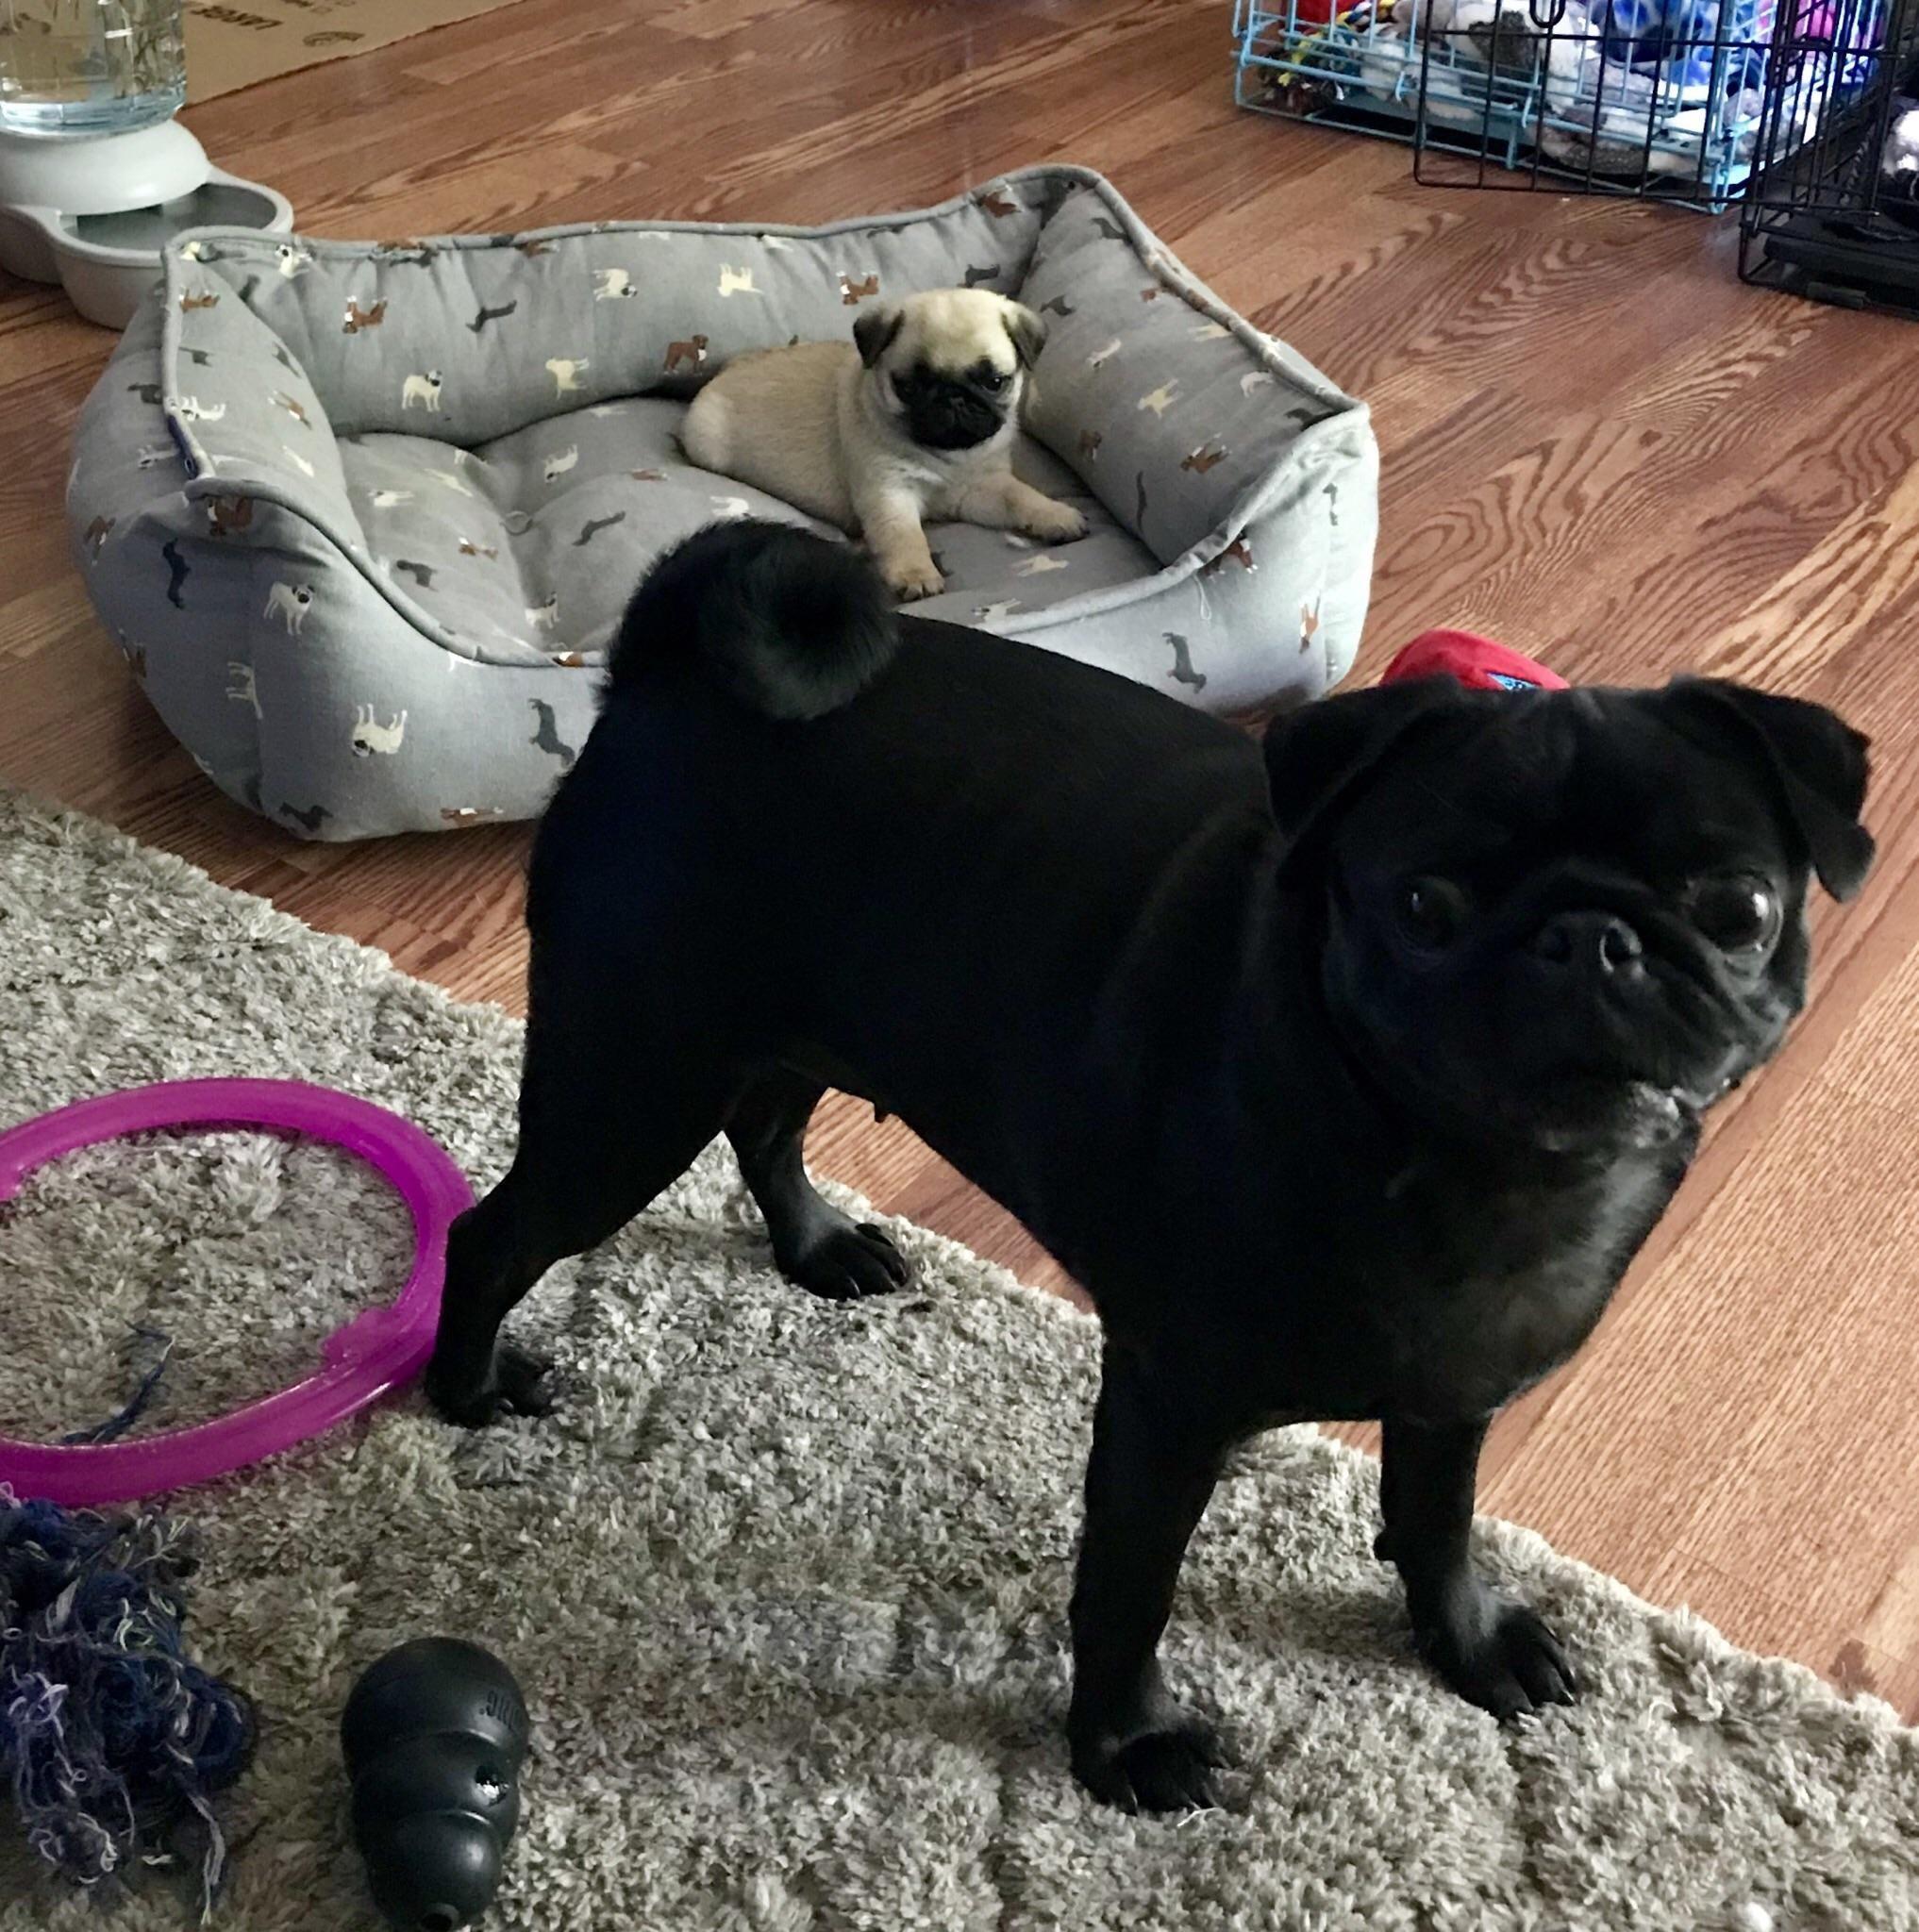 Happy pug day from dottieblack and poppyfawn https